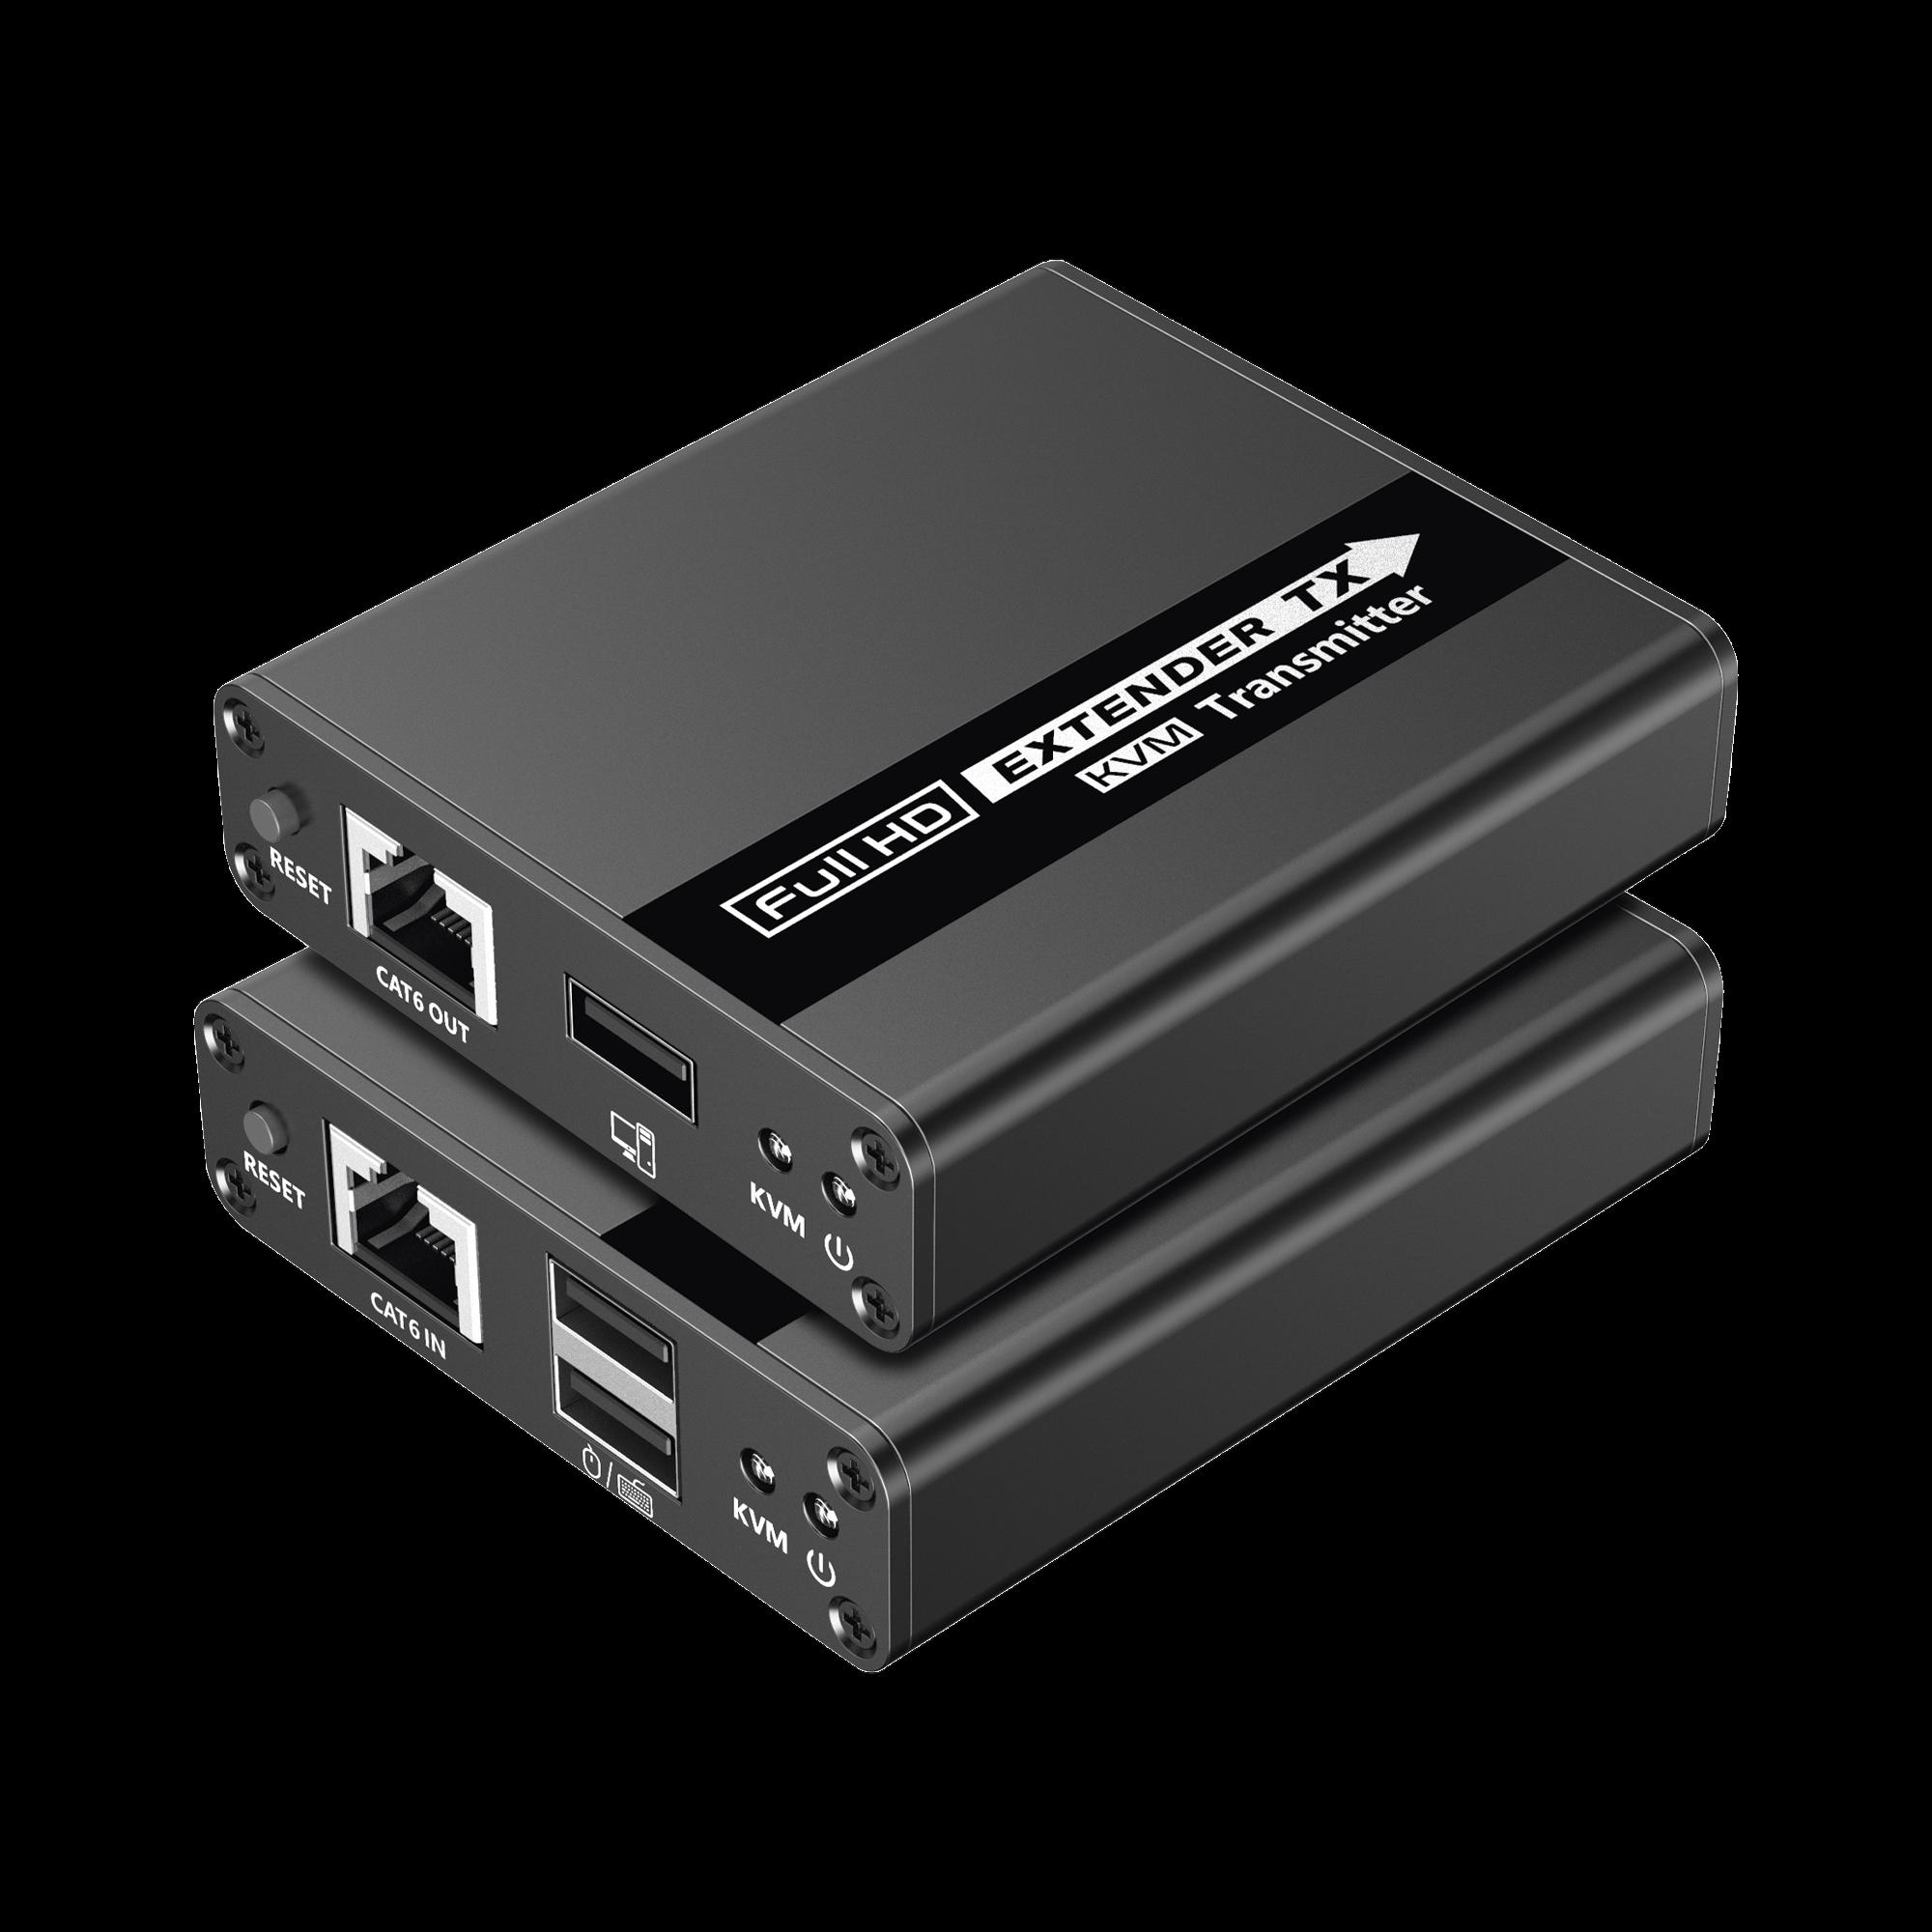 Kit extensor KVM (Teclado, Video, Mouse), punto a punto @ 70 Metros, 1080P @ 60 Hz, HDR, Latencia Cero. CAT6/6A/7